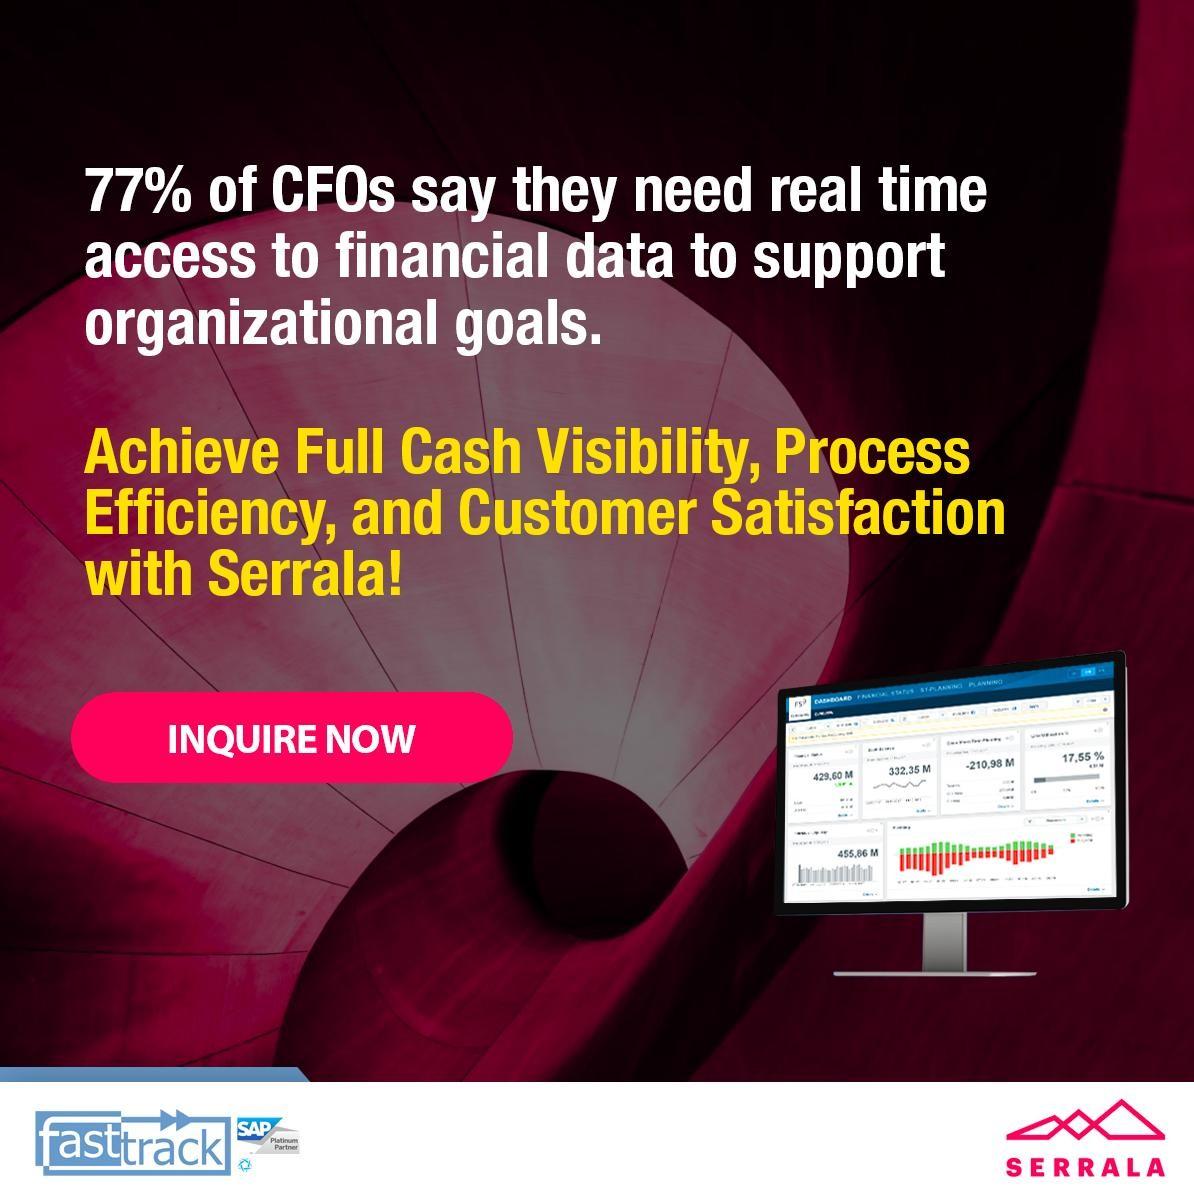 serrala cash management solutions